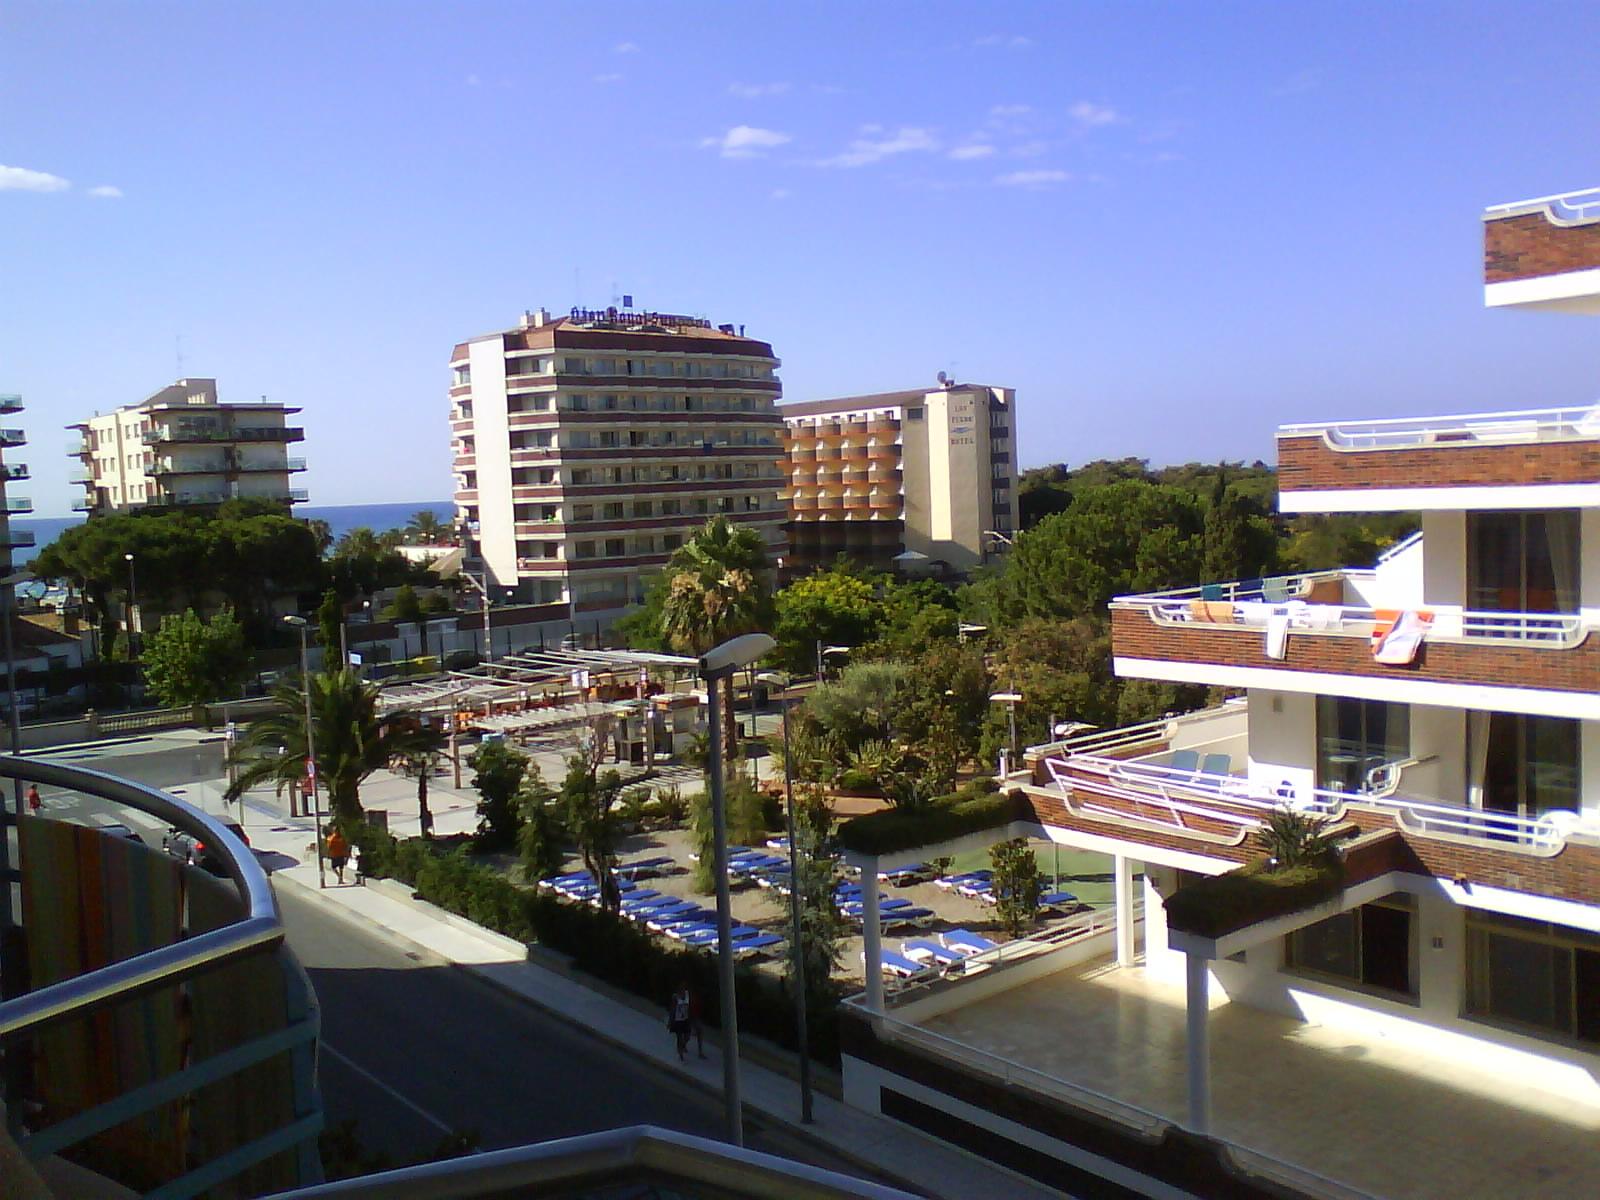 http://upload.wikimedia.org/wikipedia/commons/d/db/Santa_Susanna_strefa_hotelowa.JPG